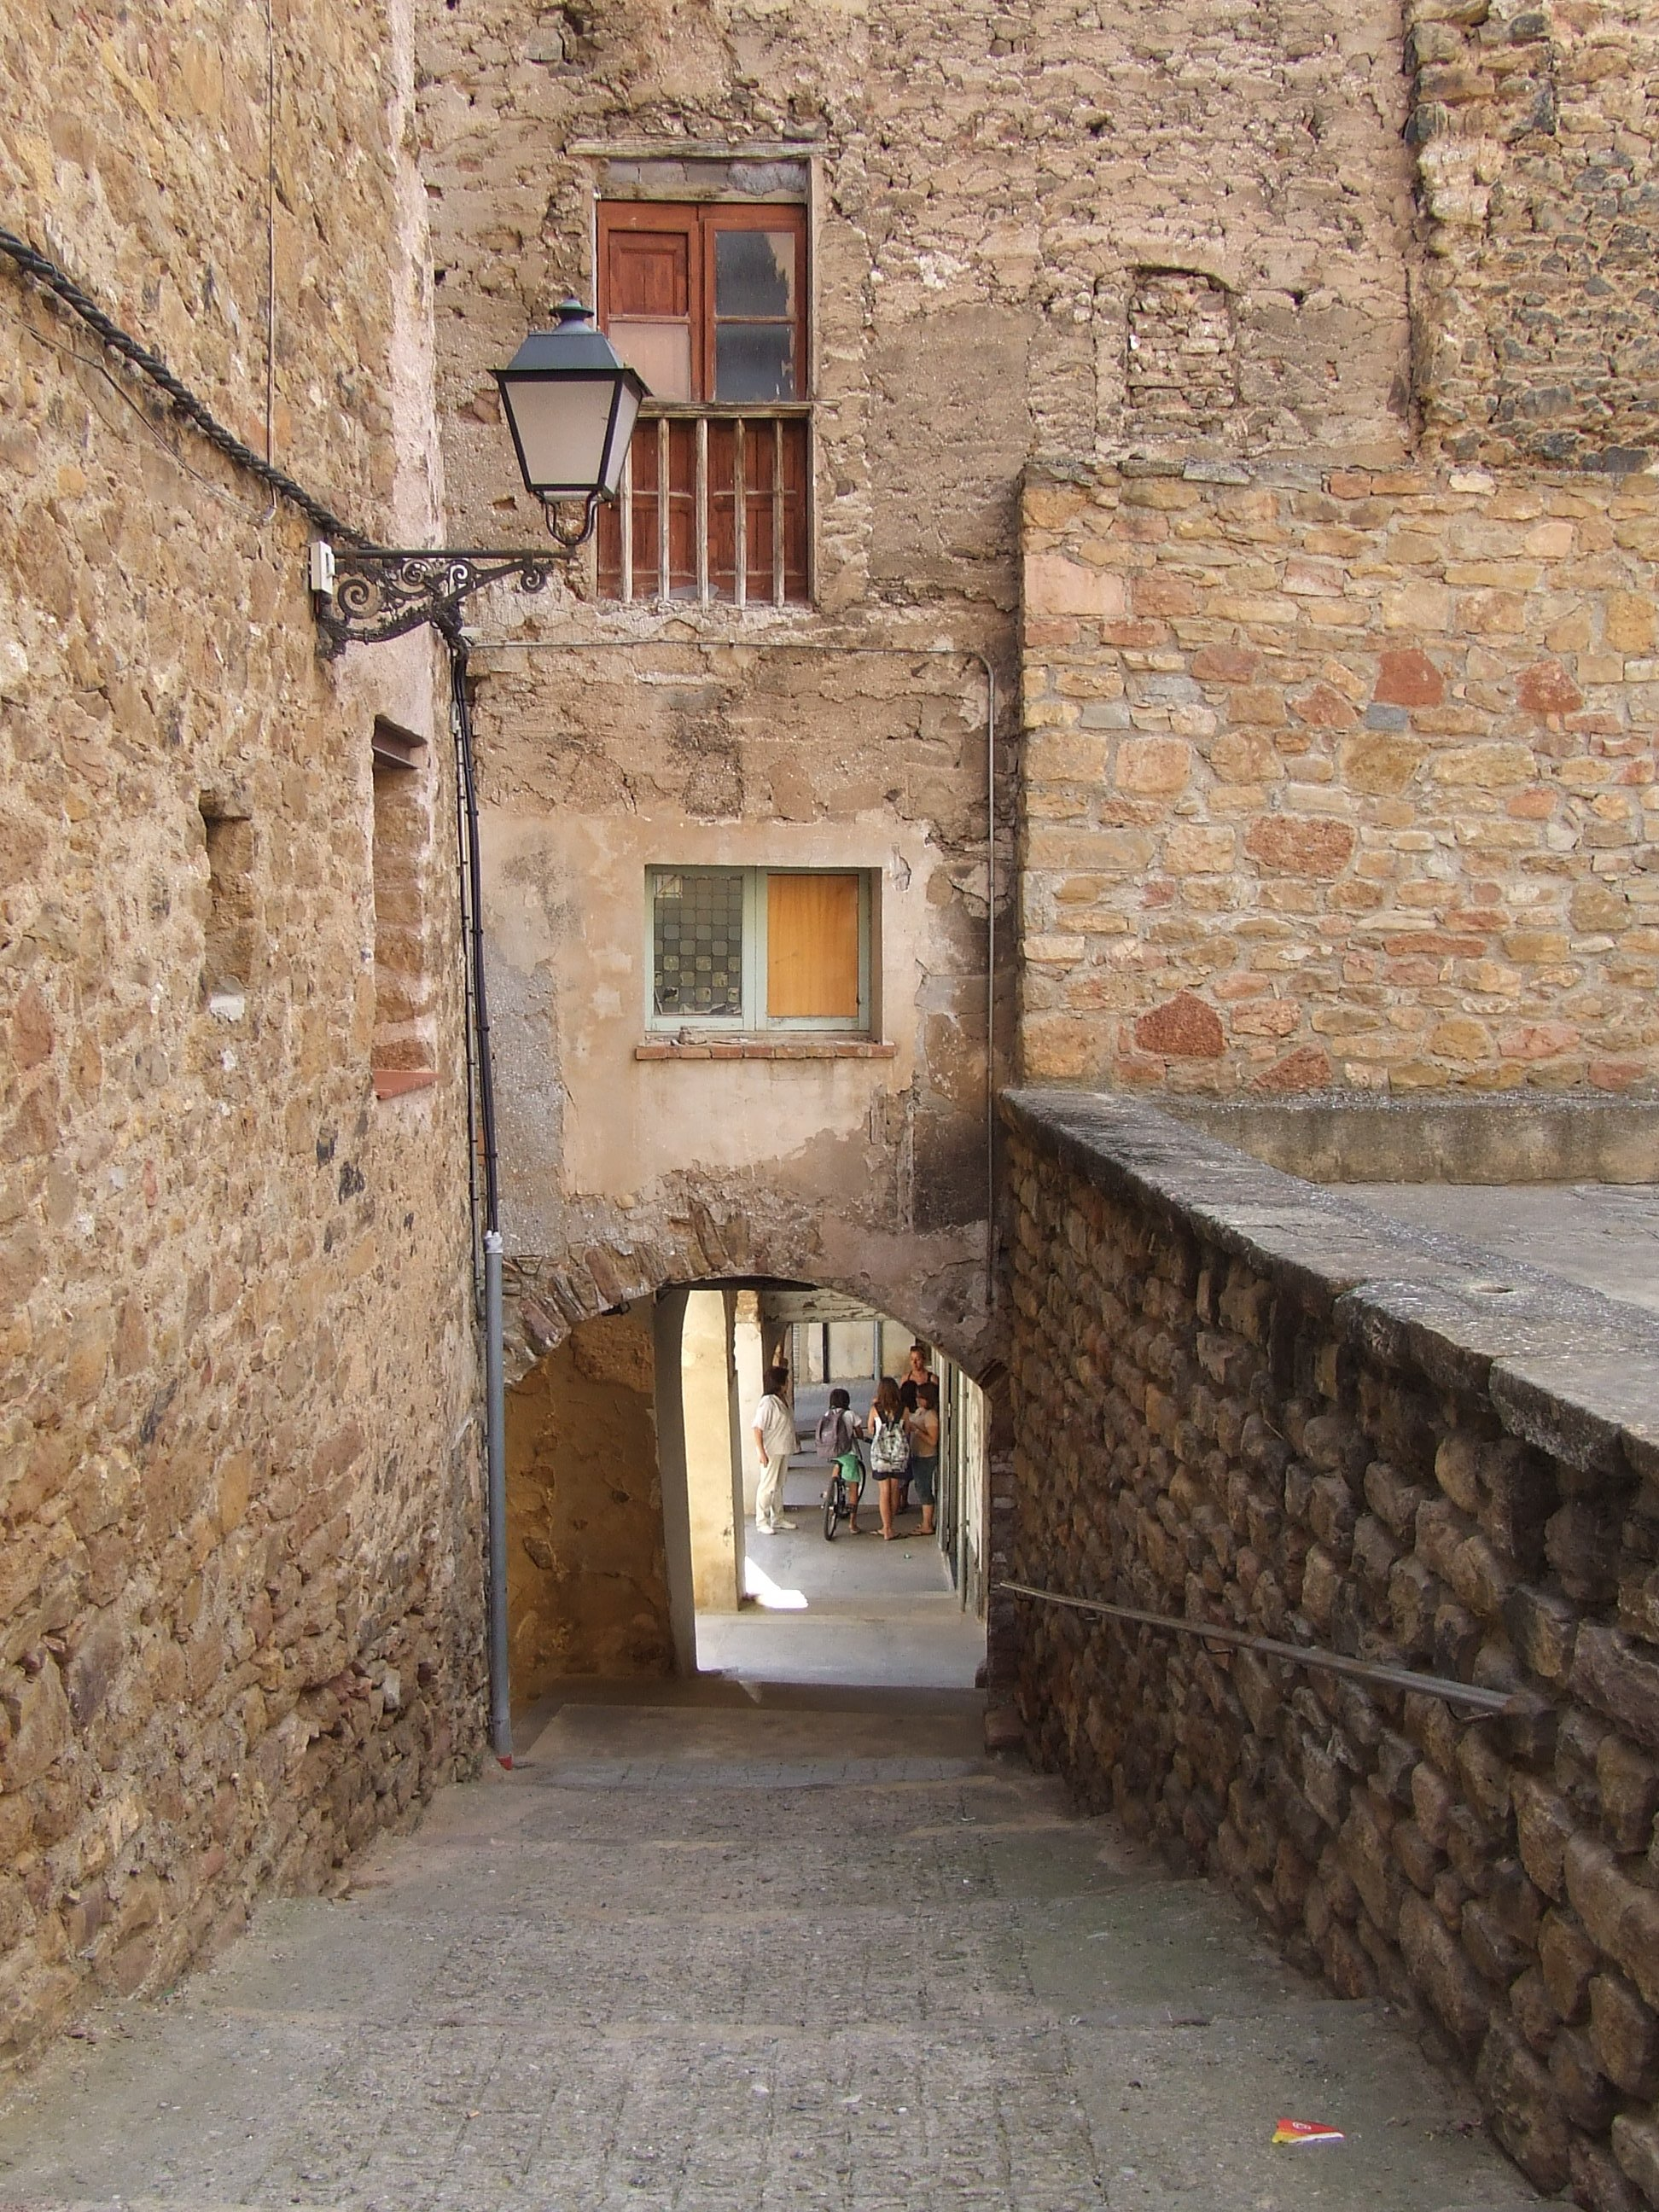 File:Talarn. Portal interior entre la pla\u00e7a i el castell.JPG - Wikimedia Commons